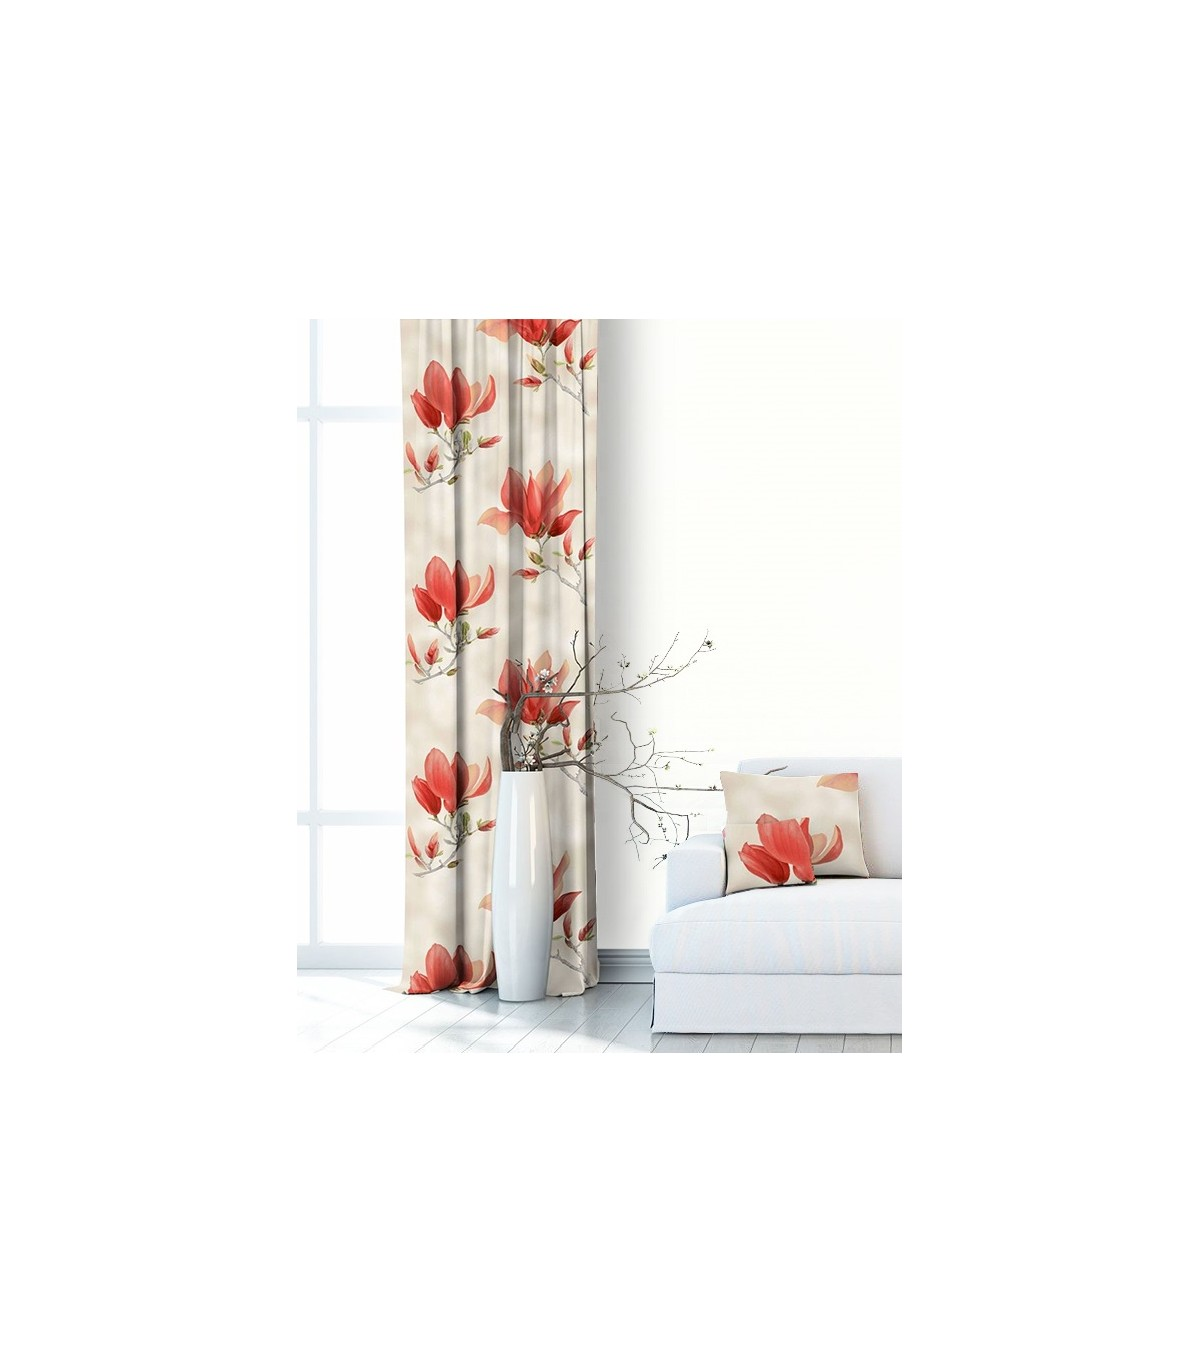 Deco Belle Best Curtains Drapery Order Online